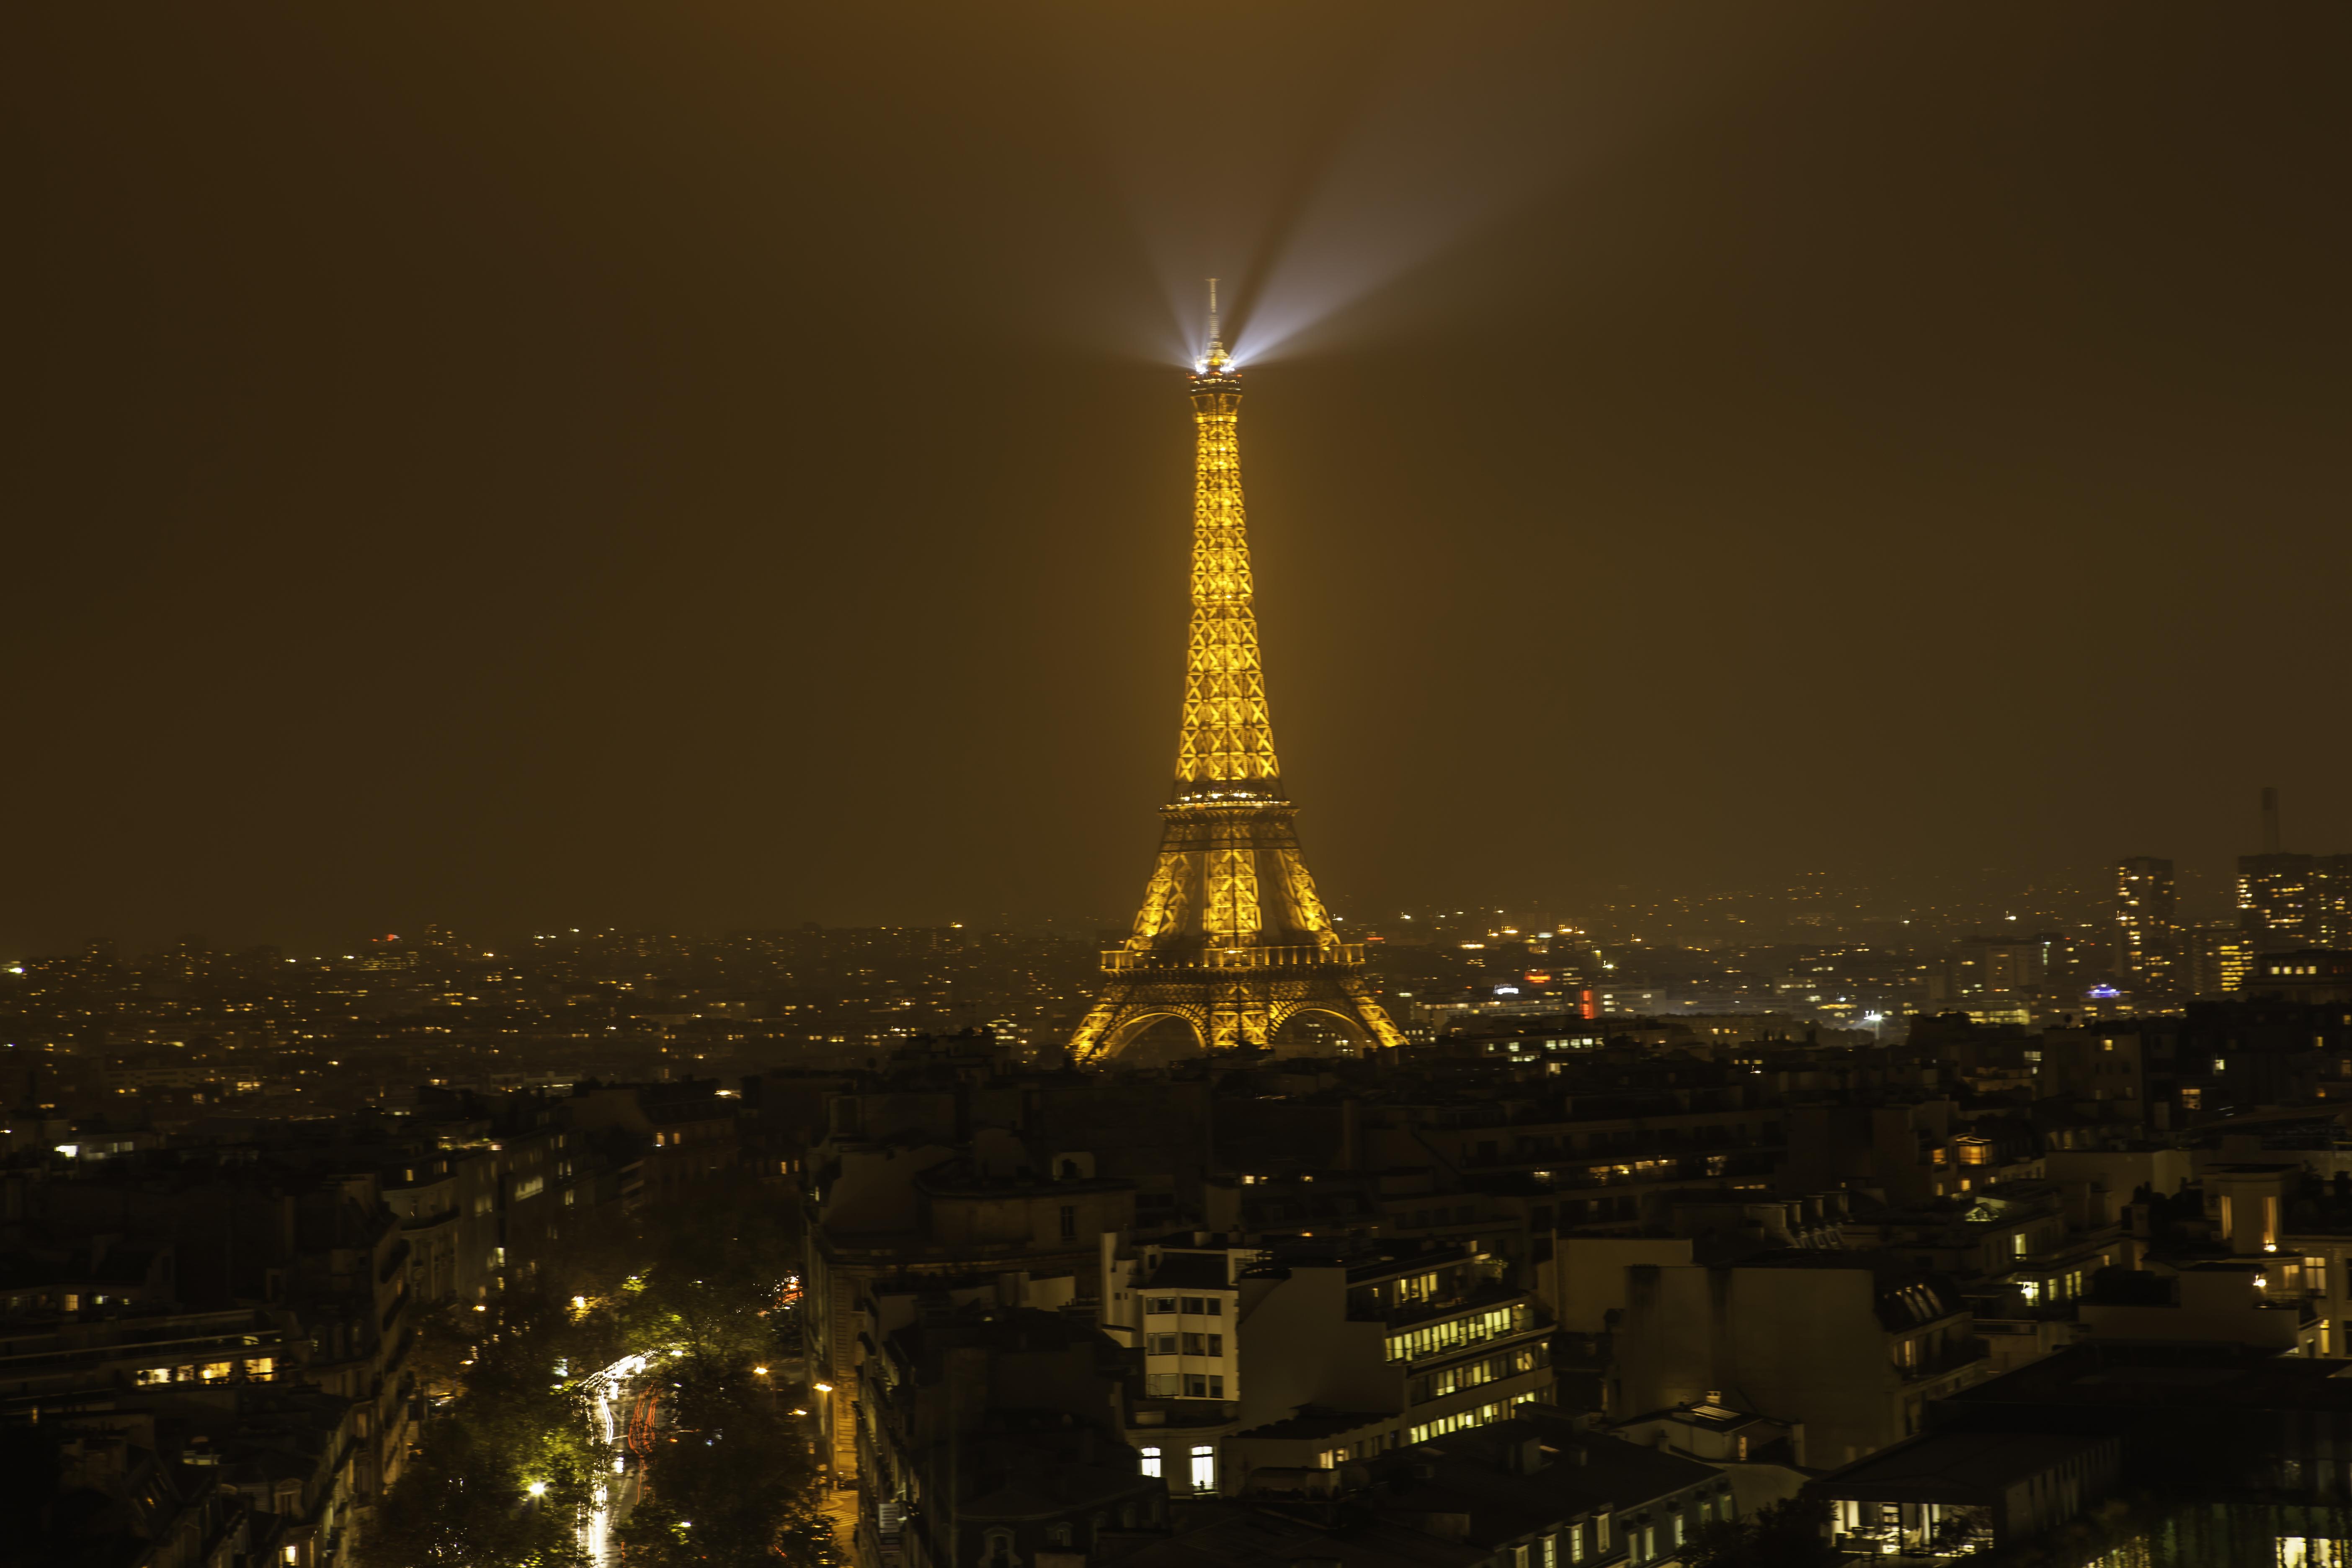 Night light wikipedia - File Eiffel Tower In Cityscape Of Paris At Night Light 8210912882 Jpg